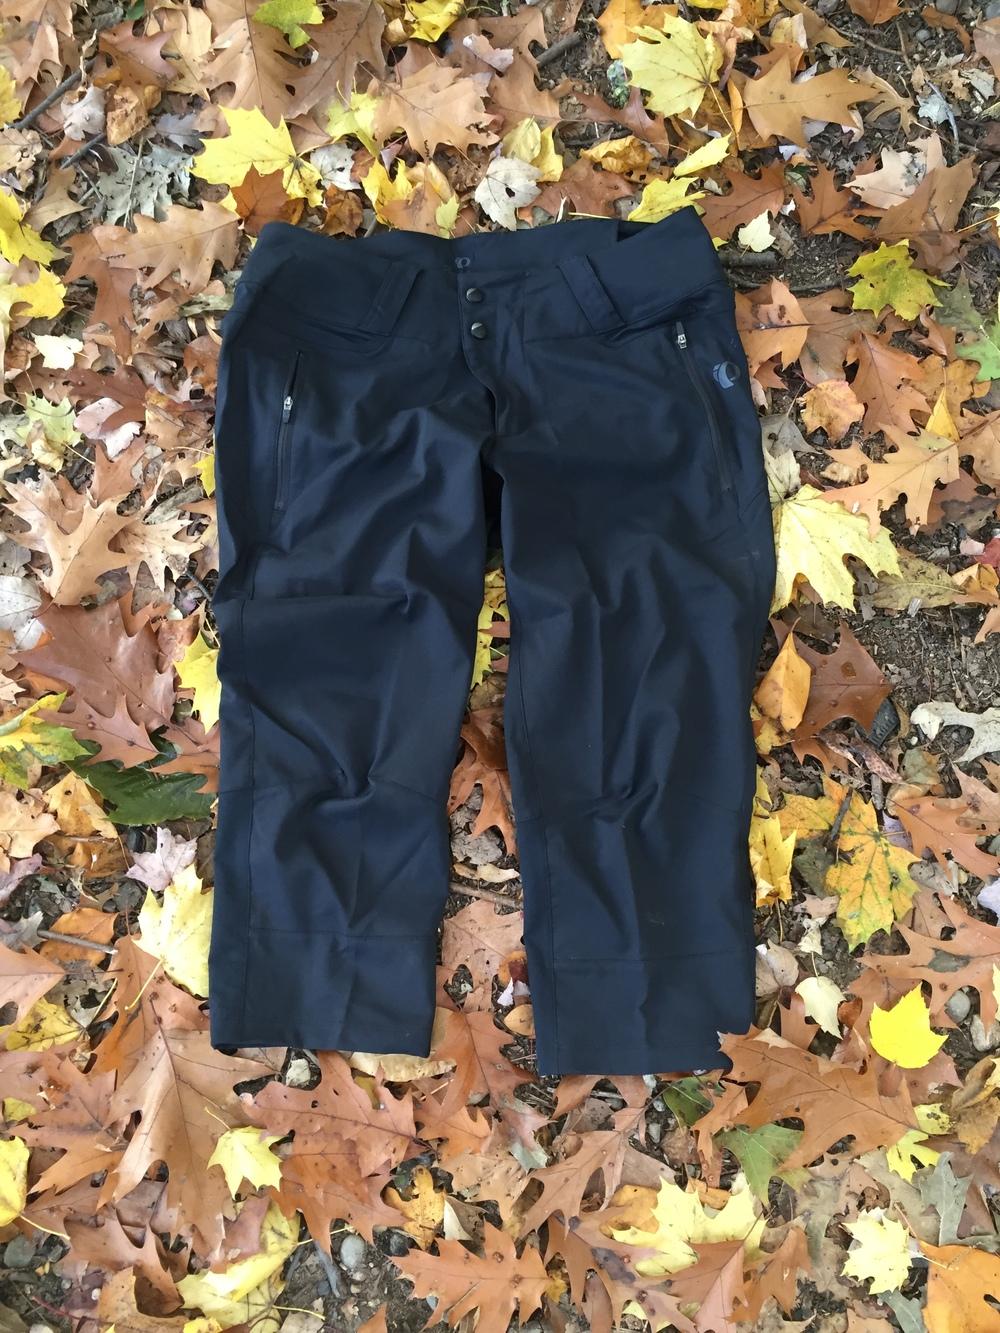 Pearl Izumi 3/4 length shorts